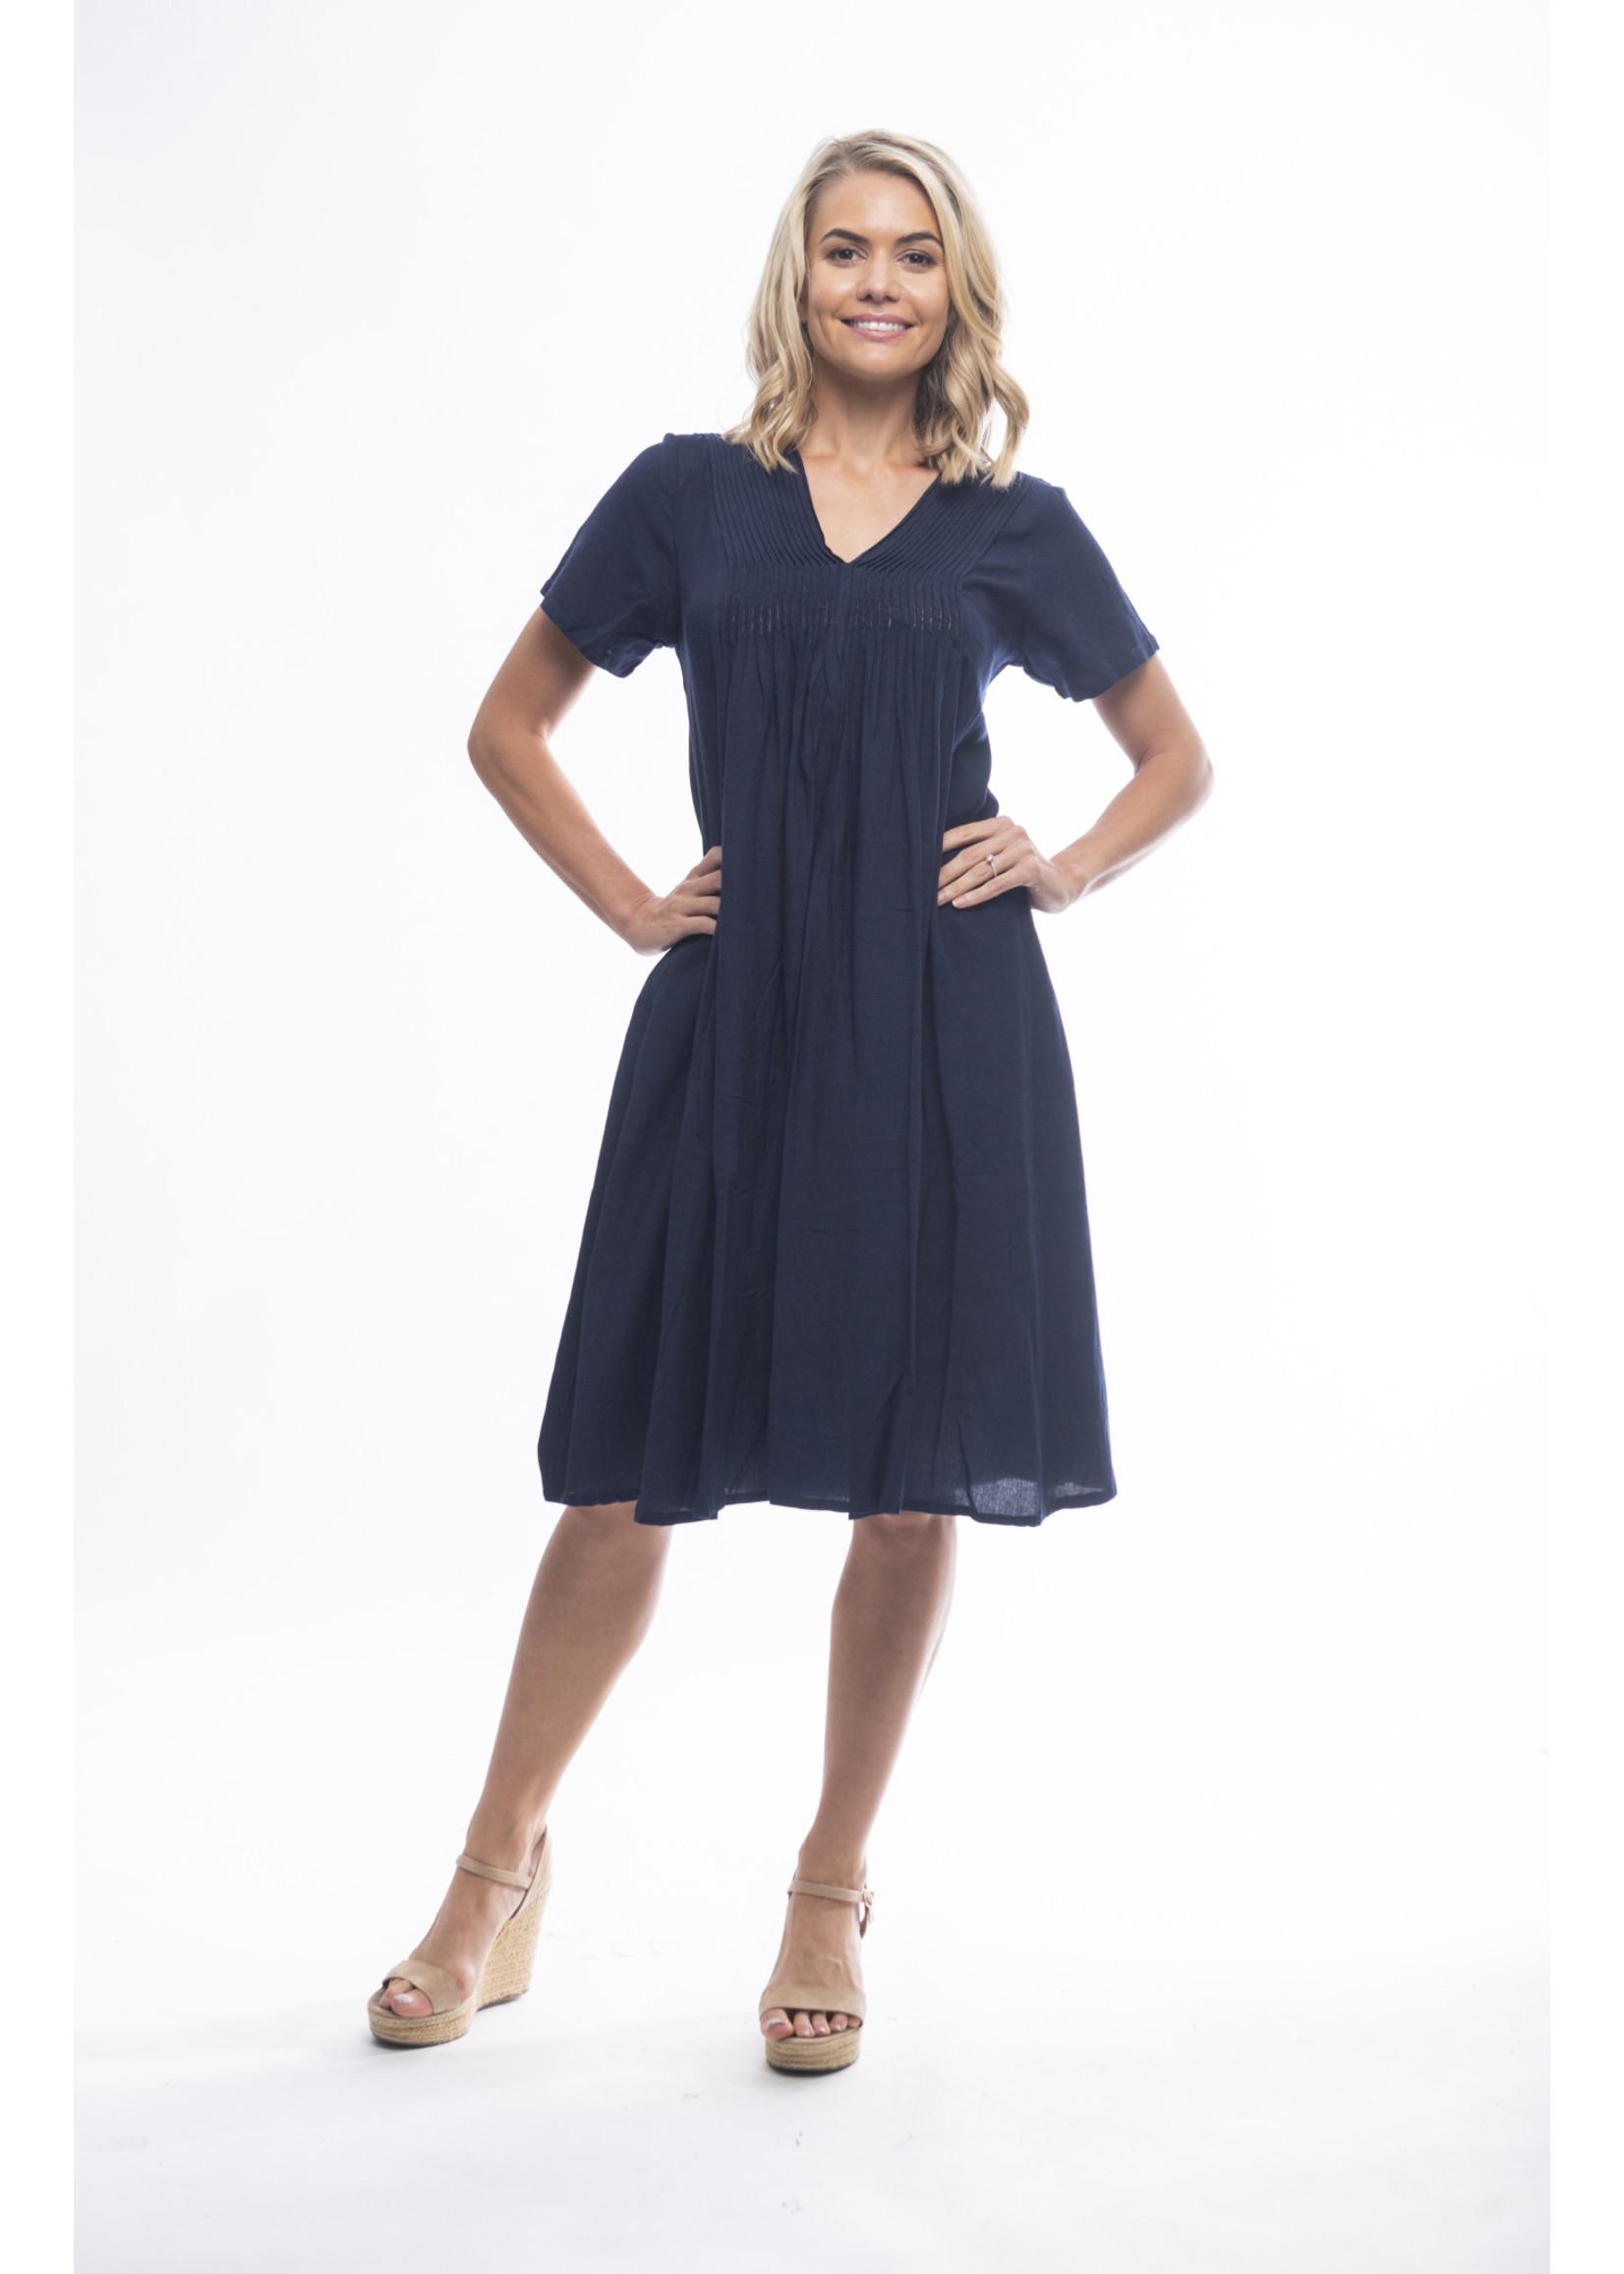 Orientique Navy V-Neck Linen Dress